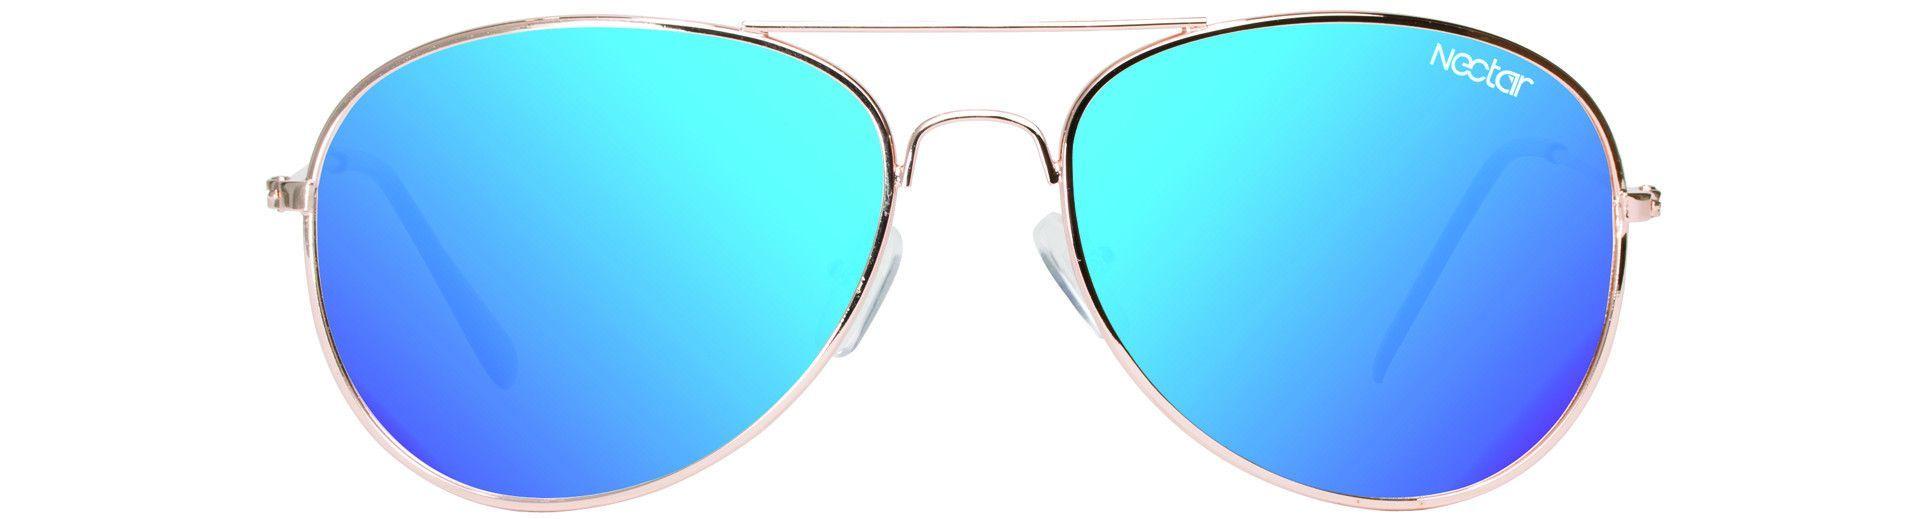 Nectar Sunglasses - Apollo Polarized